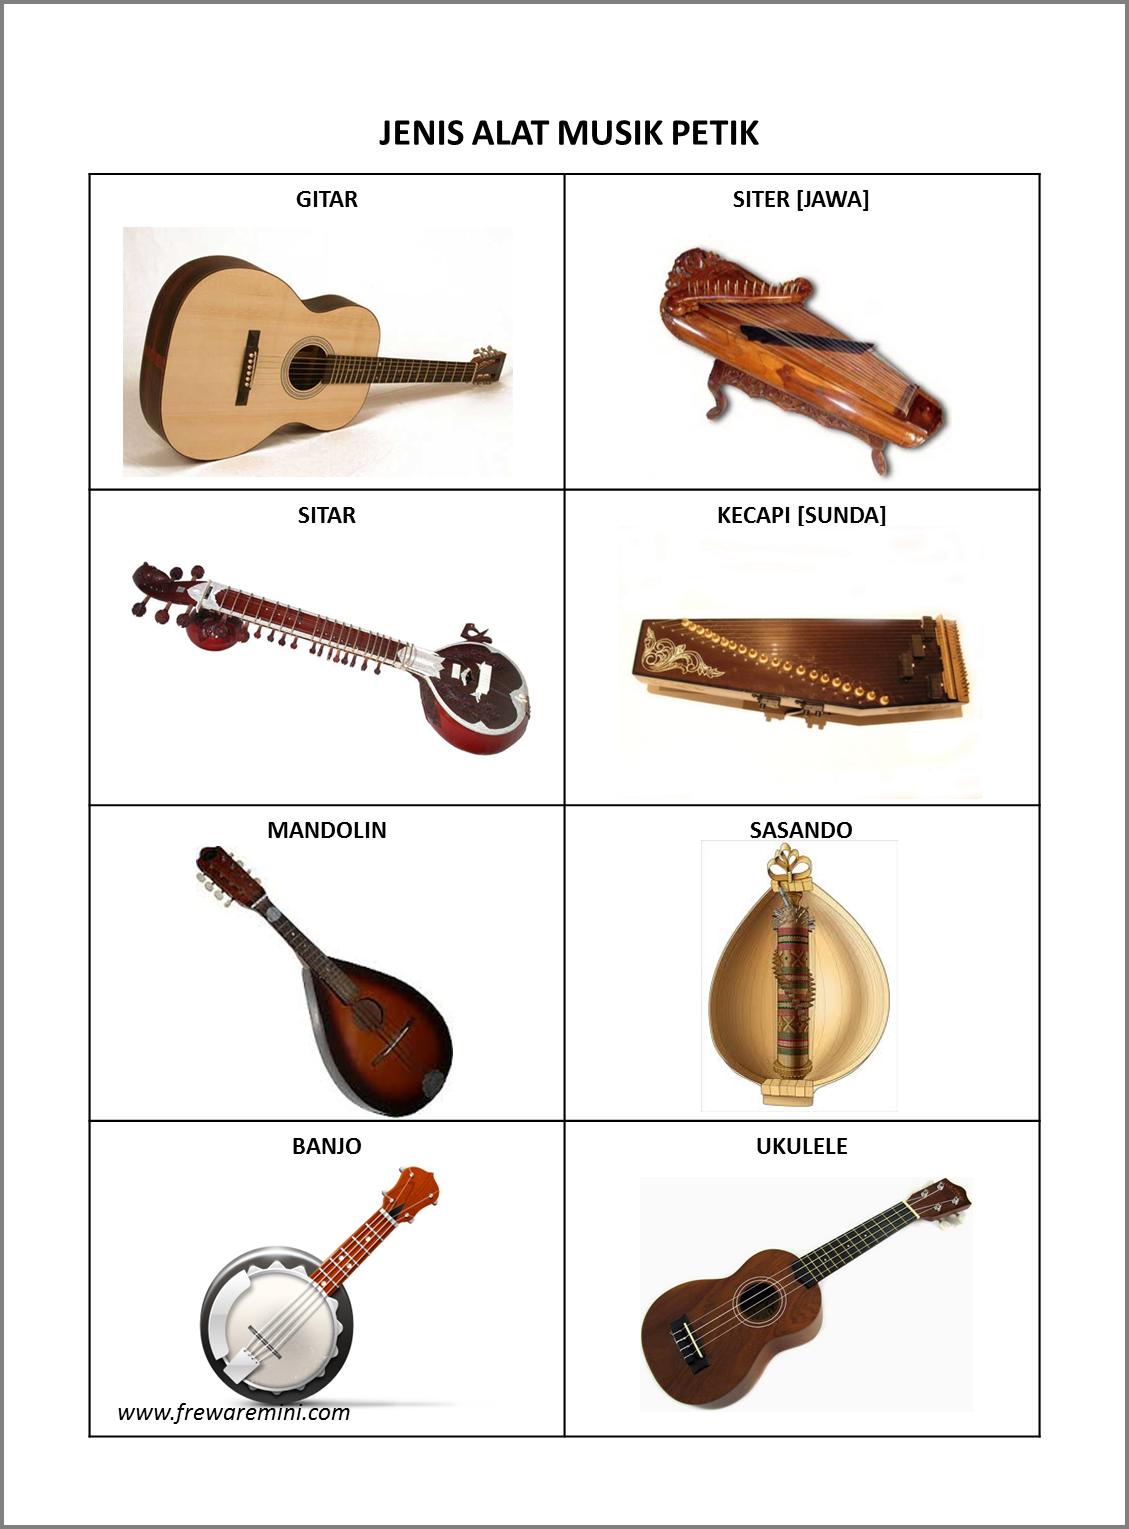 Music Unix: Berbagai macam jenis Alat musik